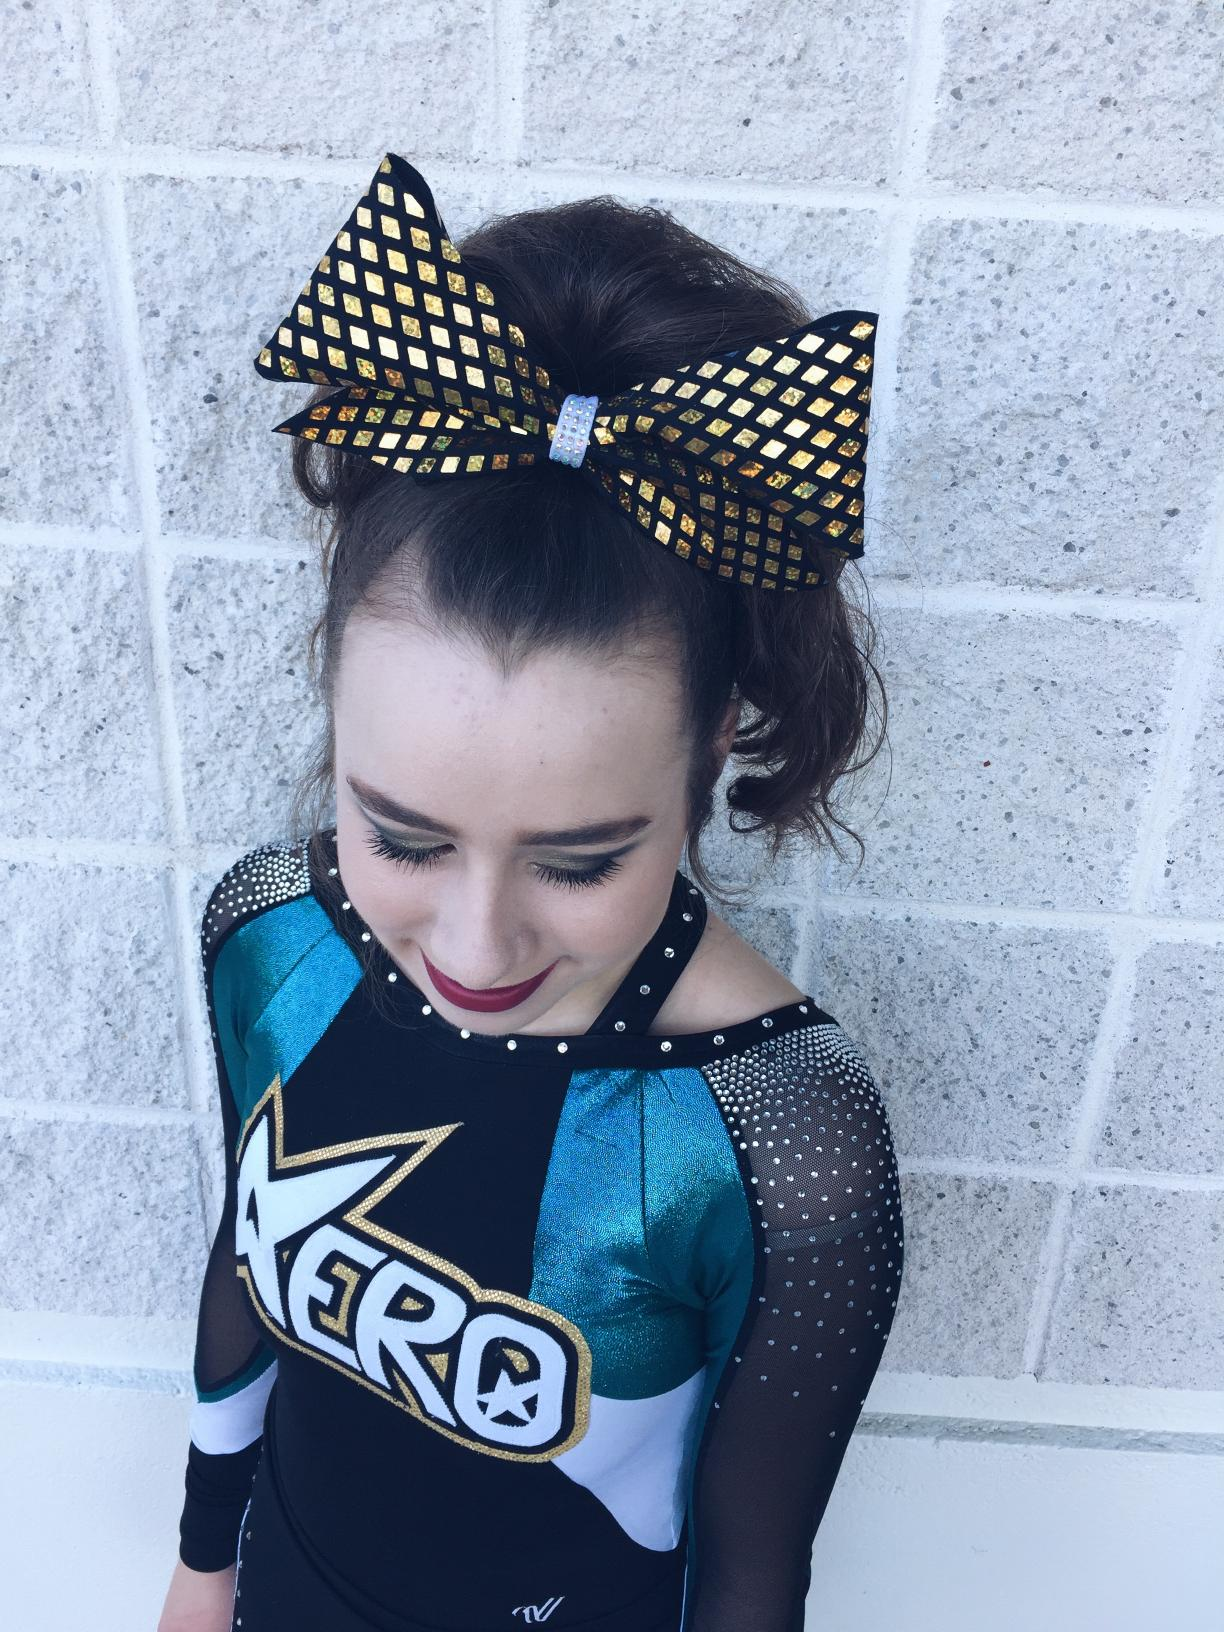 all-star cheerleading